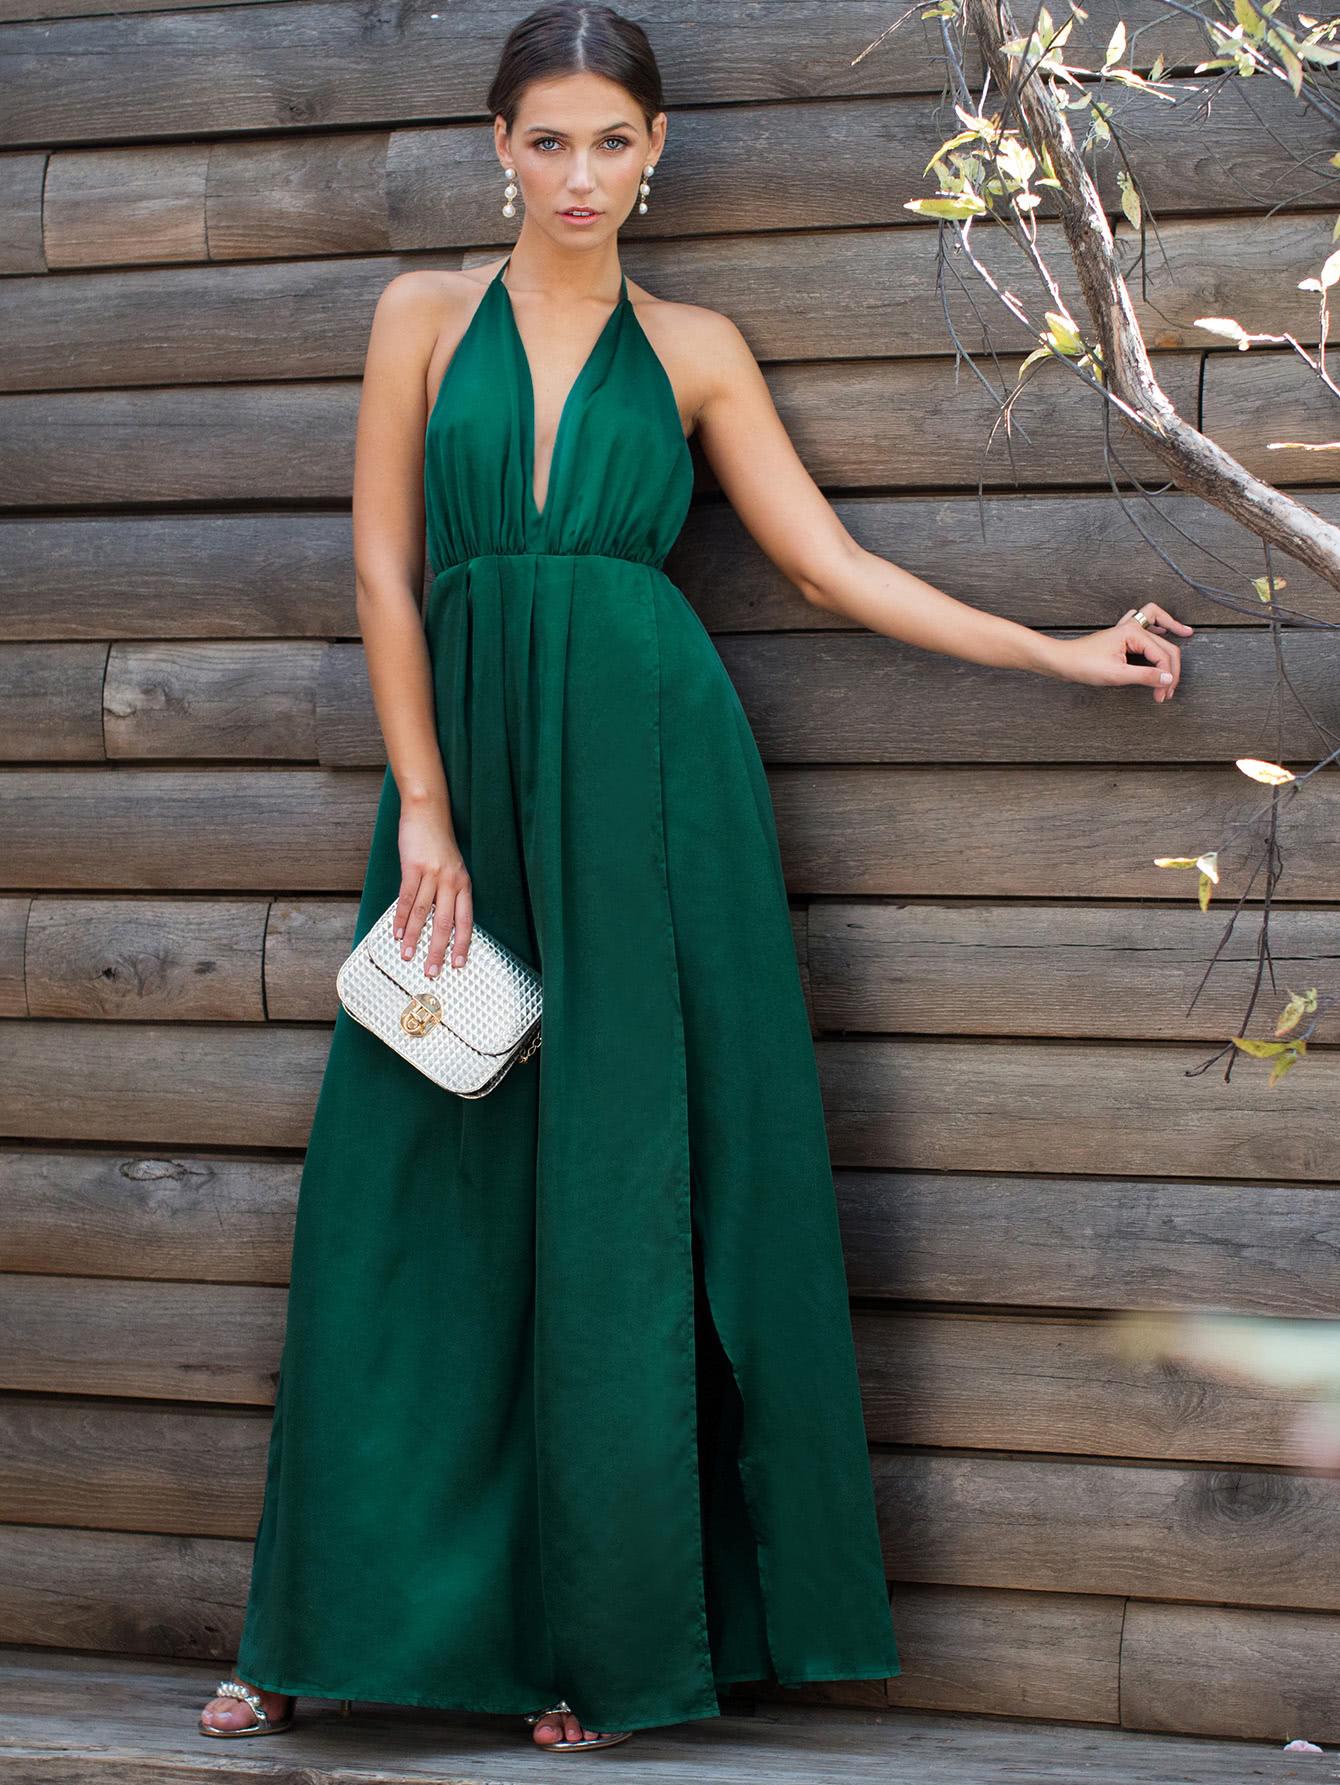 Plunge Neck Crisscross Back High Slit Wrap Cami Dress high slit long sleeveless cami dress